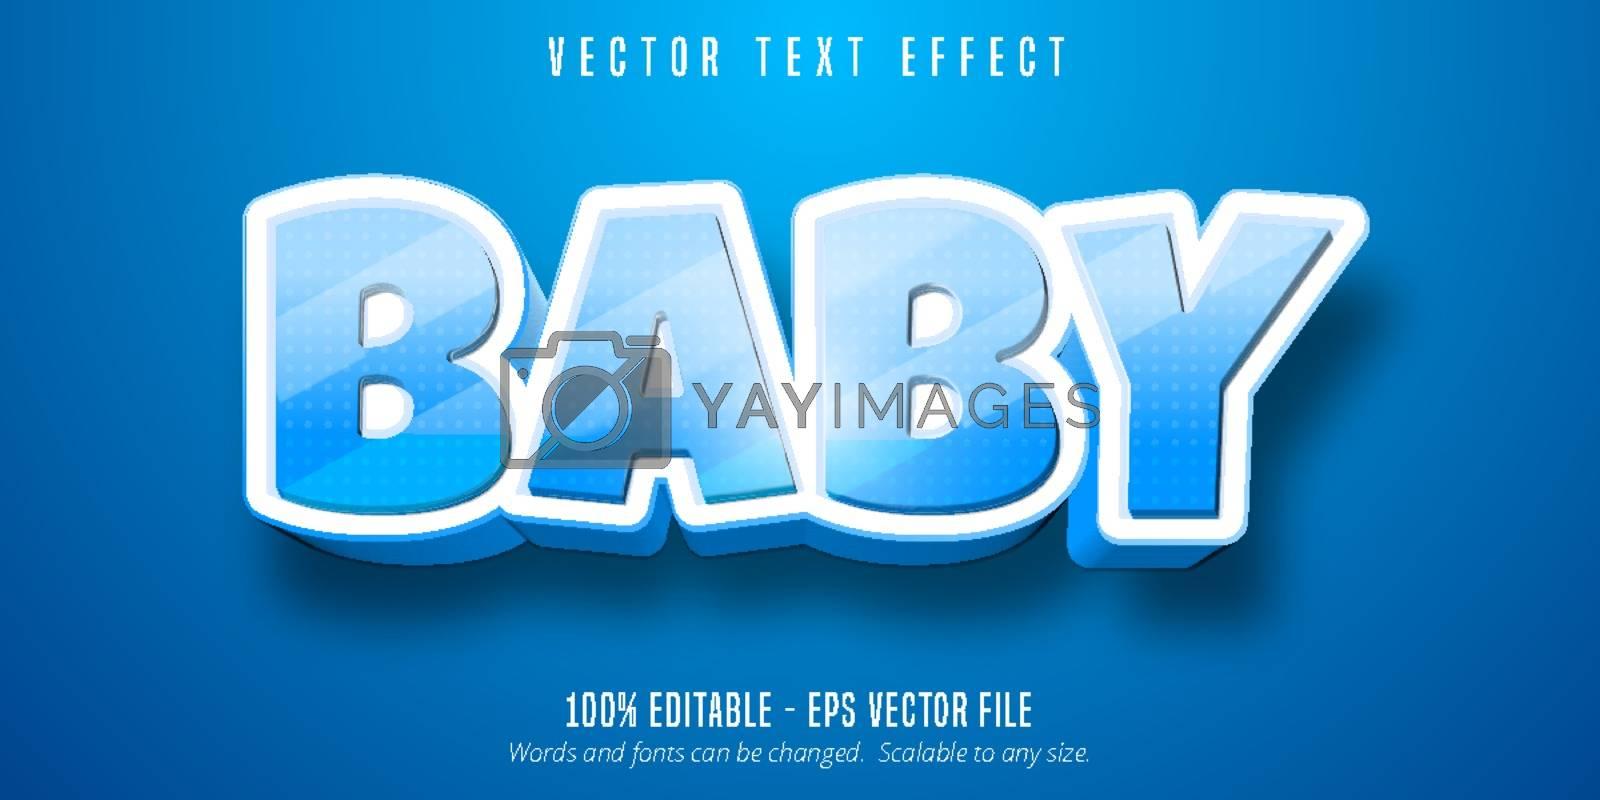 Baby text, cartoon style editable text effect